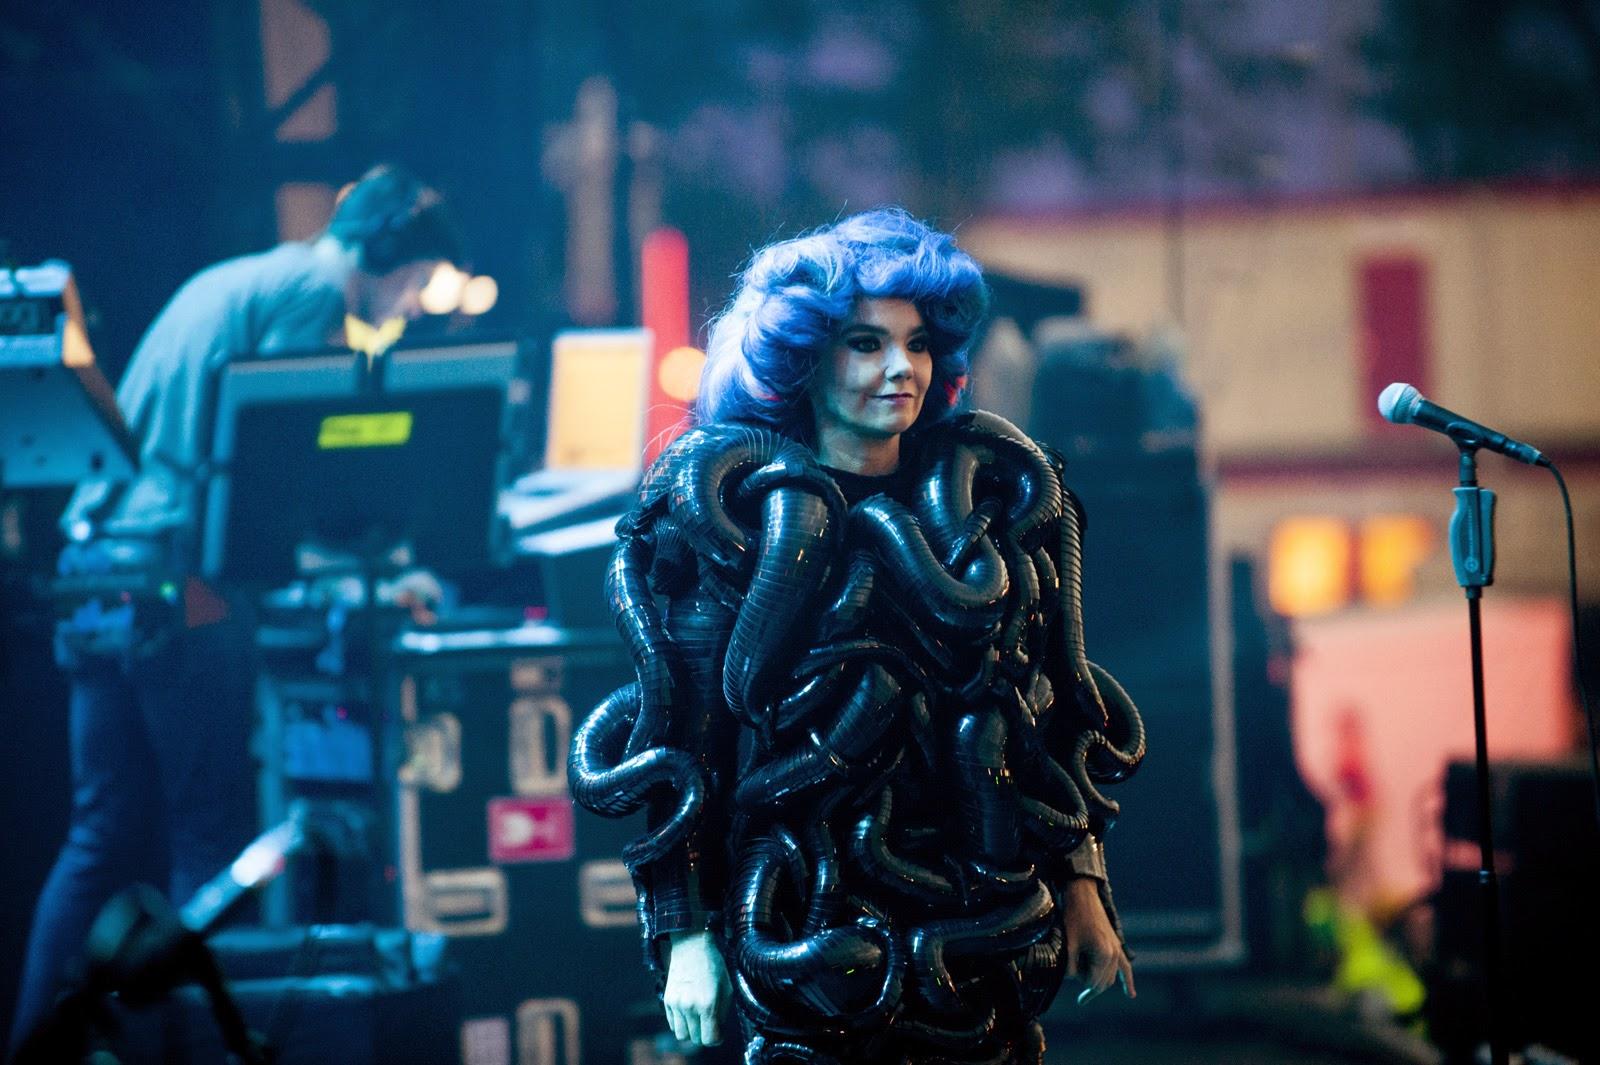 björk guðmundsdóttir: Björk - Live @ Pukkelpop, Kiewit ...